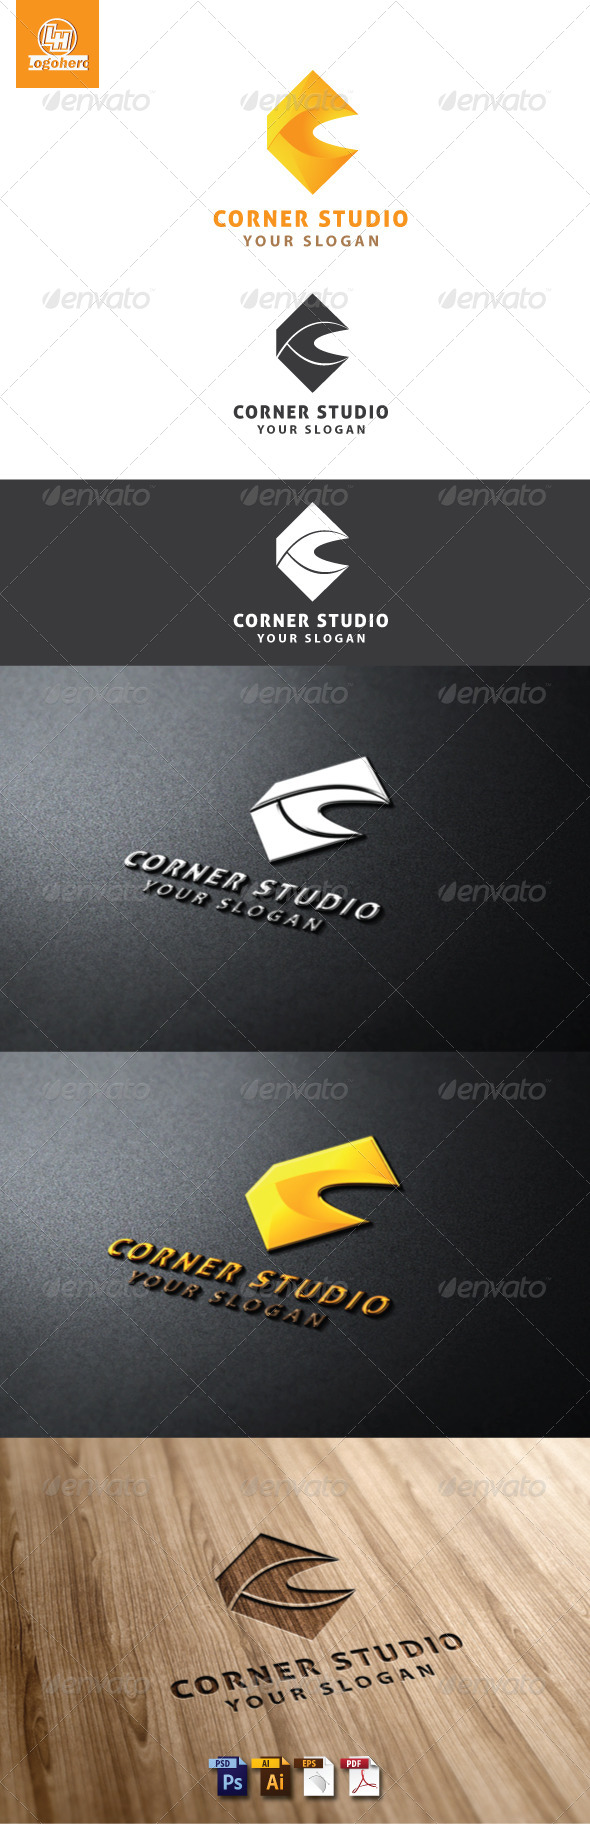 GraphicRiver Corner Studio Logo Template 4632467